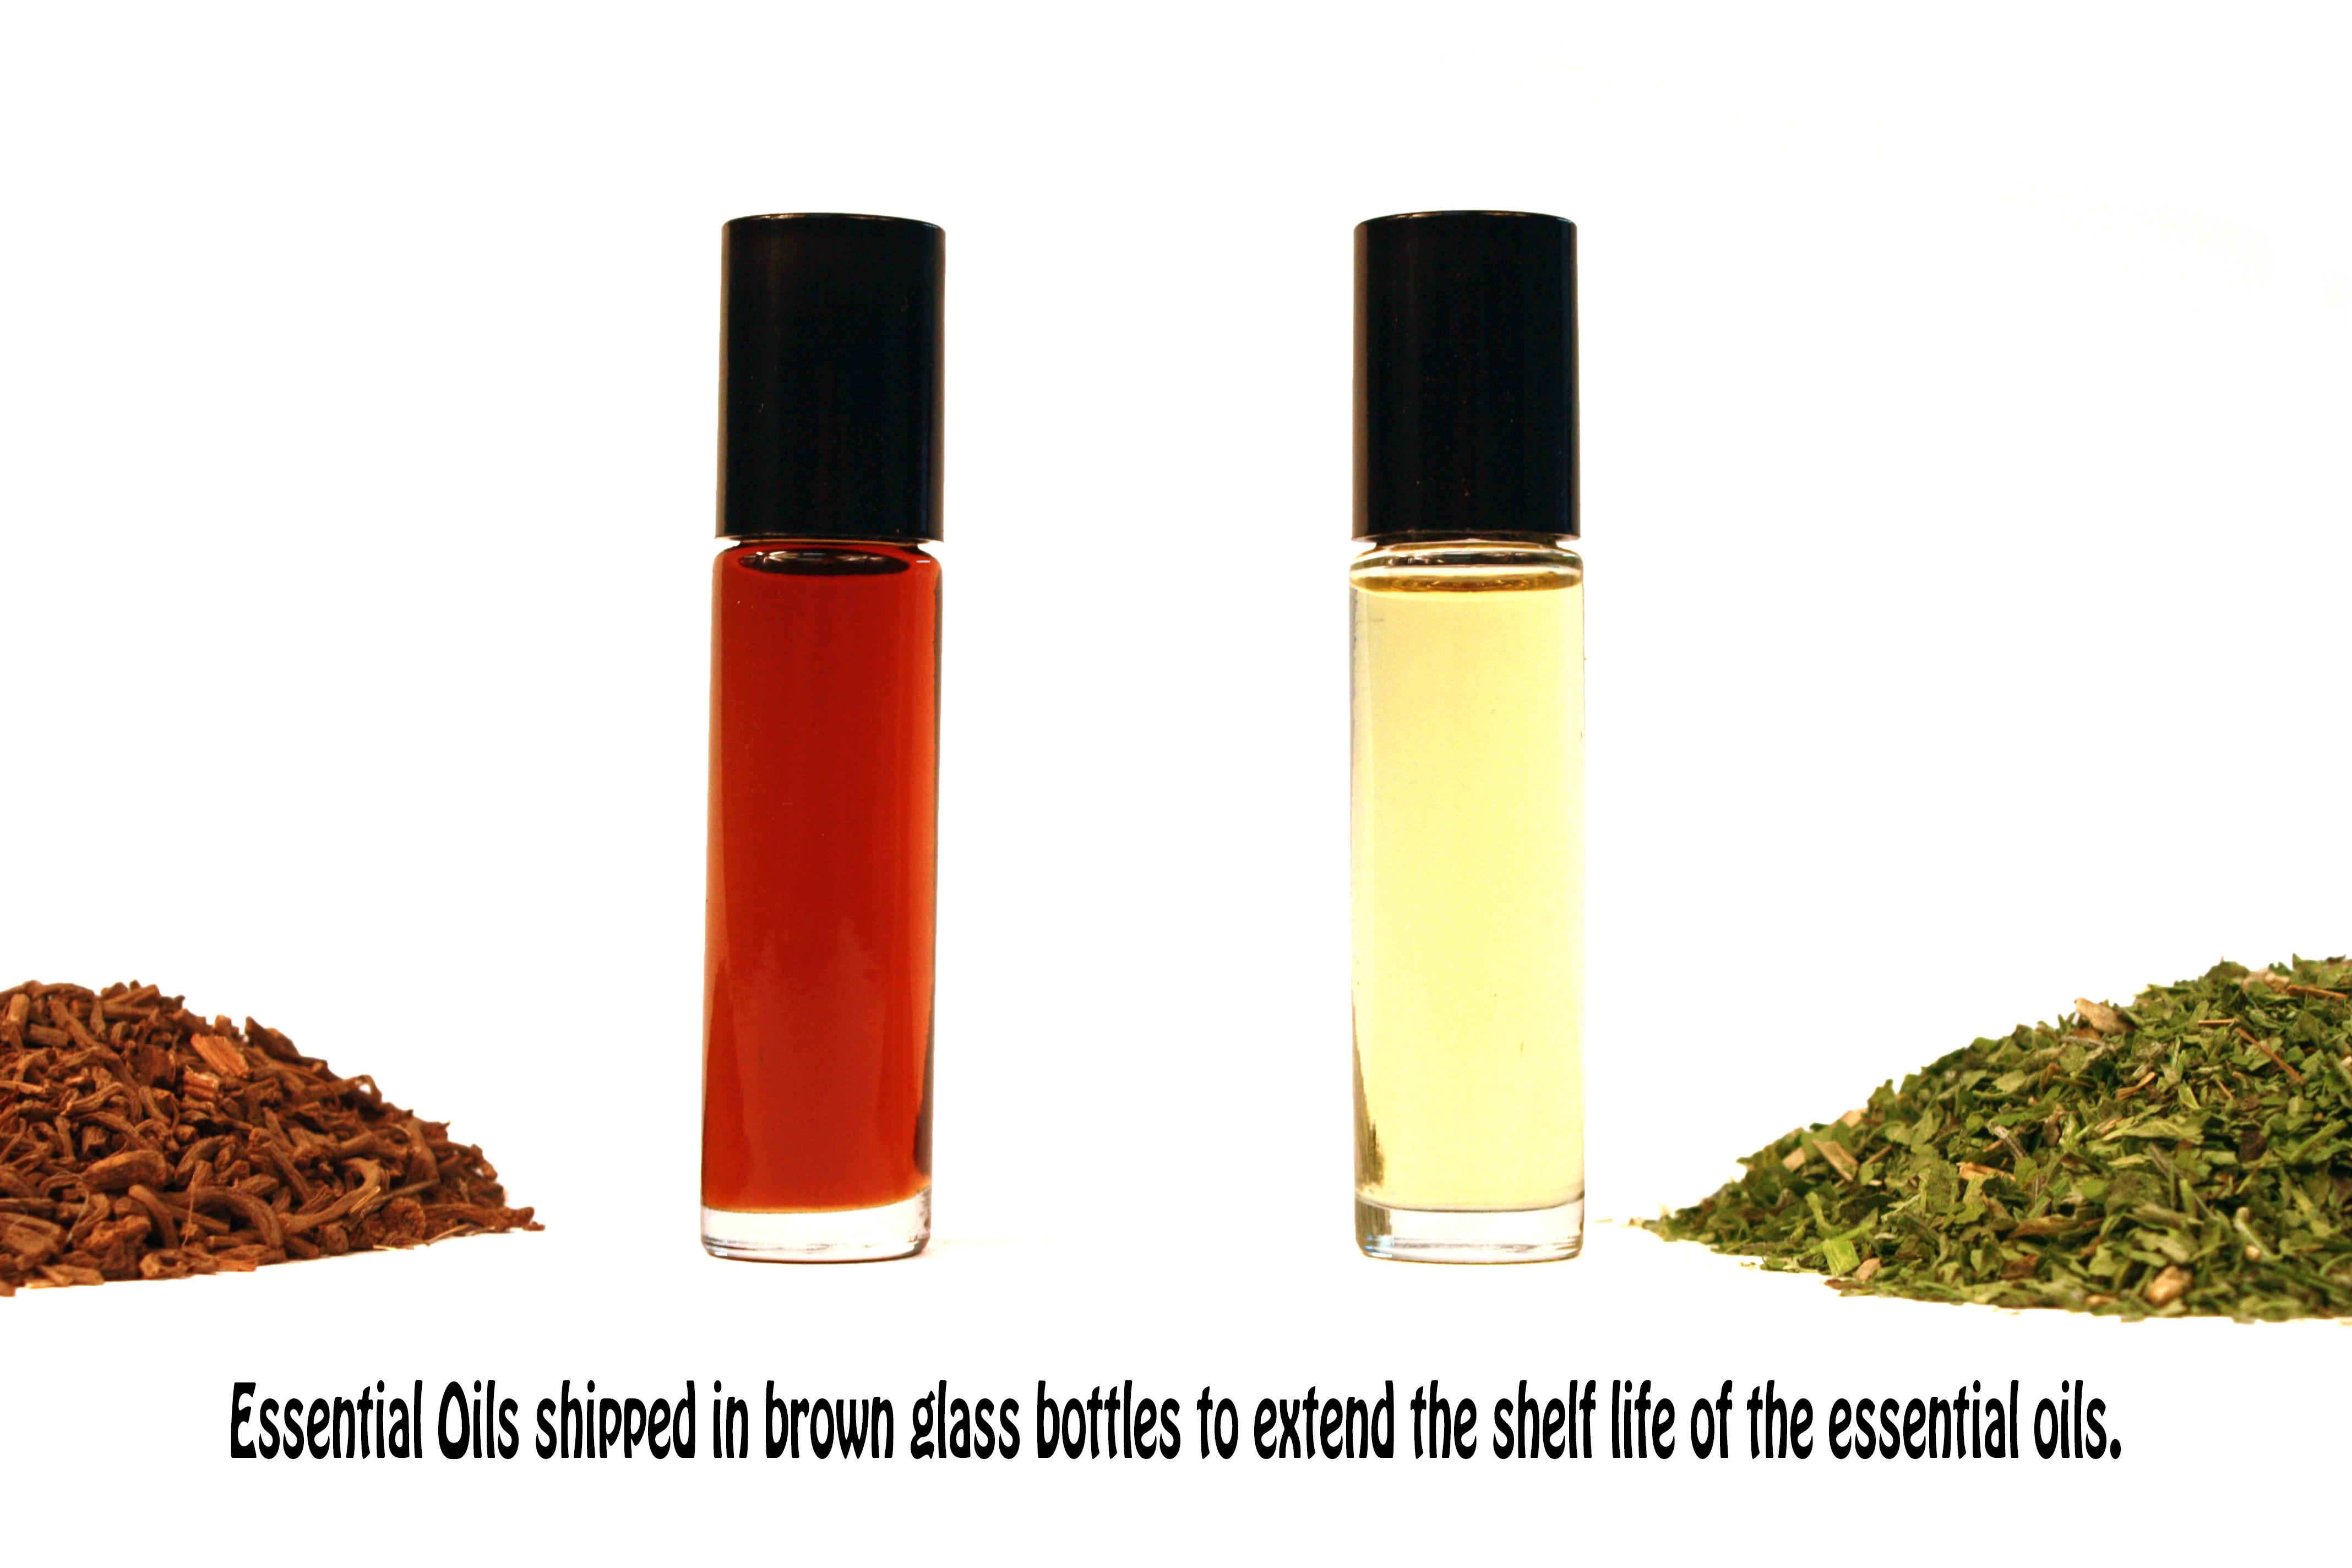 Catnip & Valerian Essential Oils - rocket fuel for your roommate!